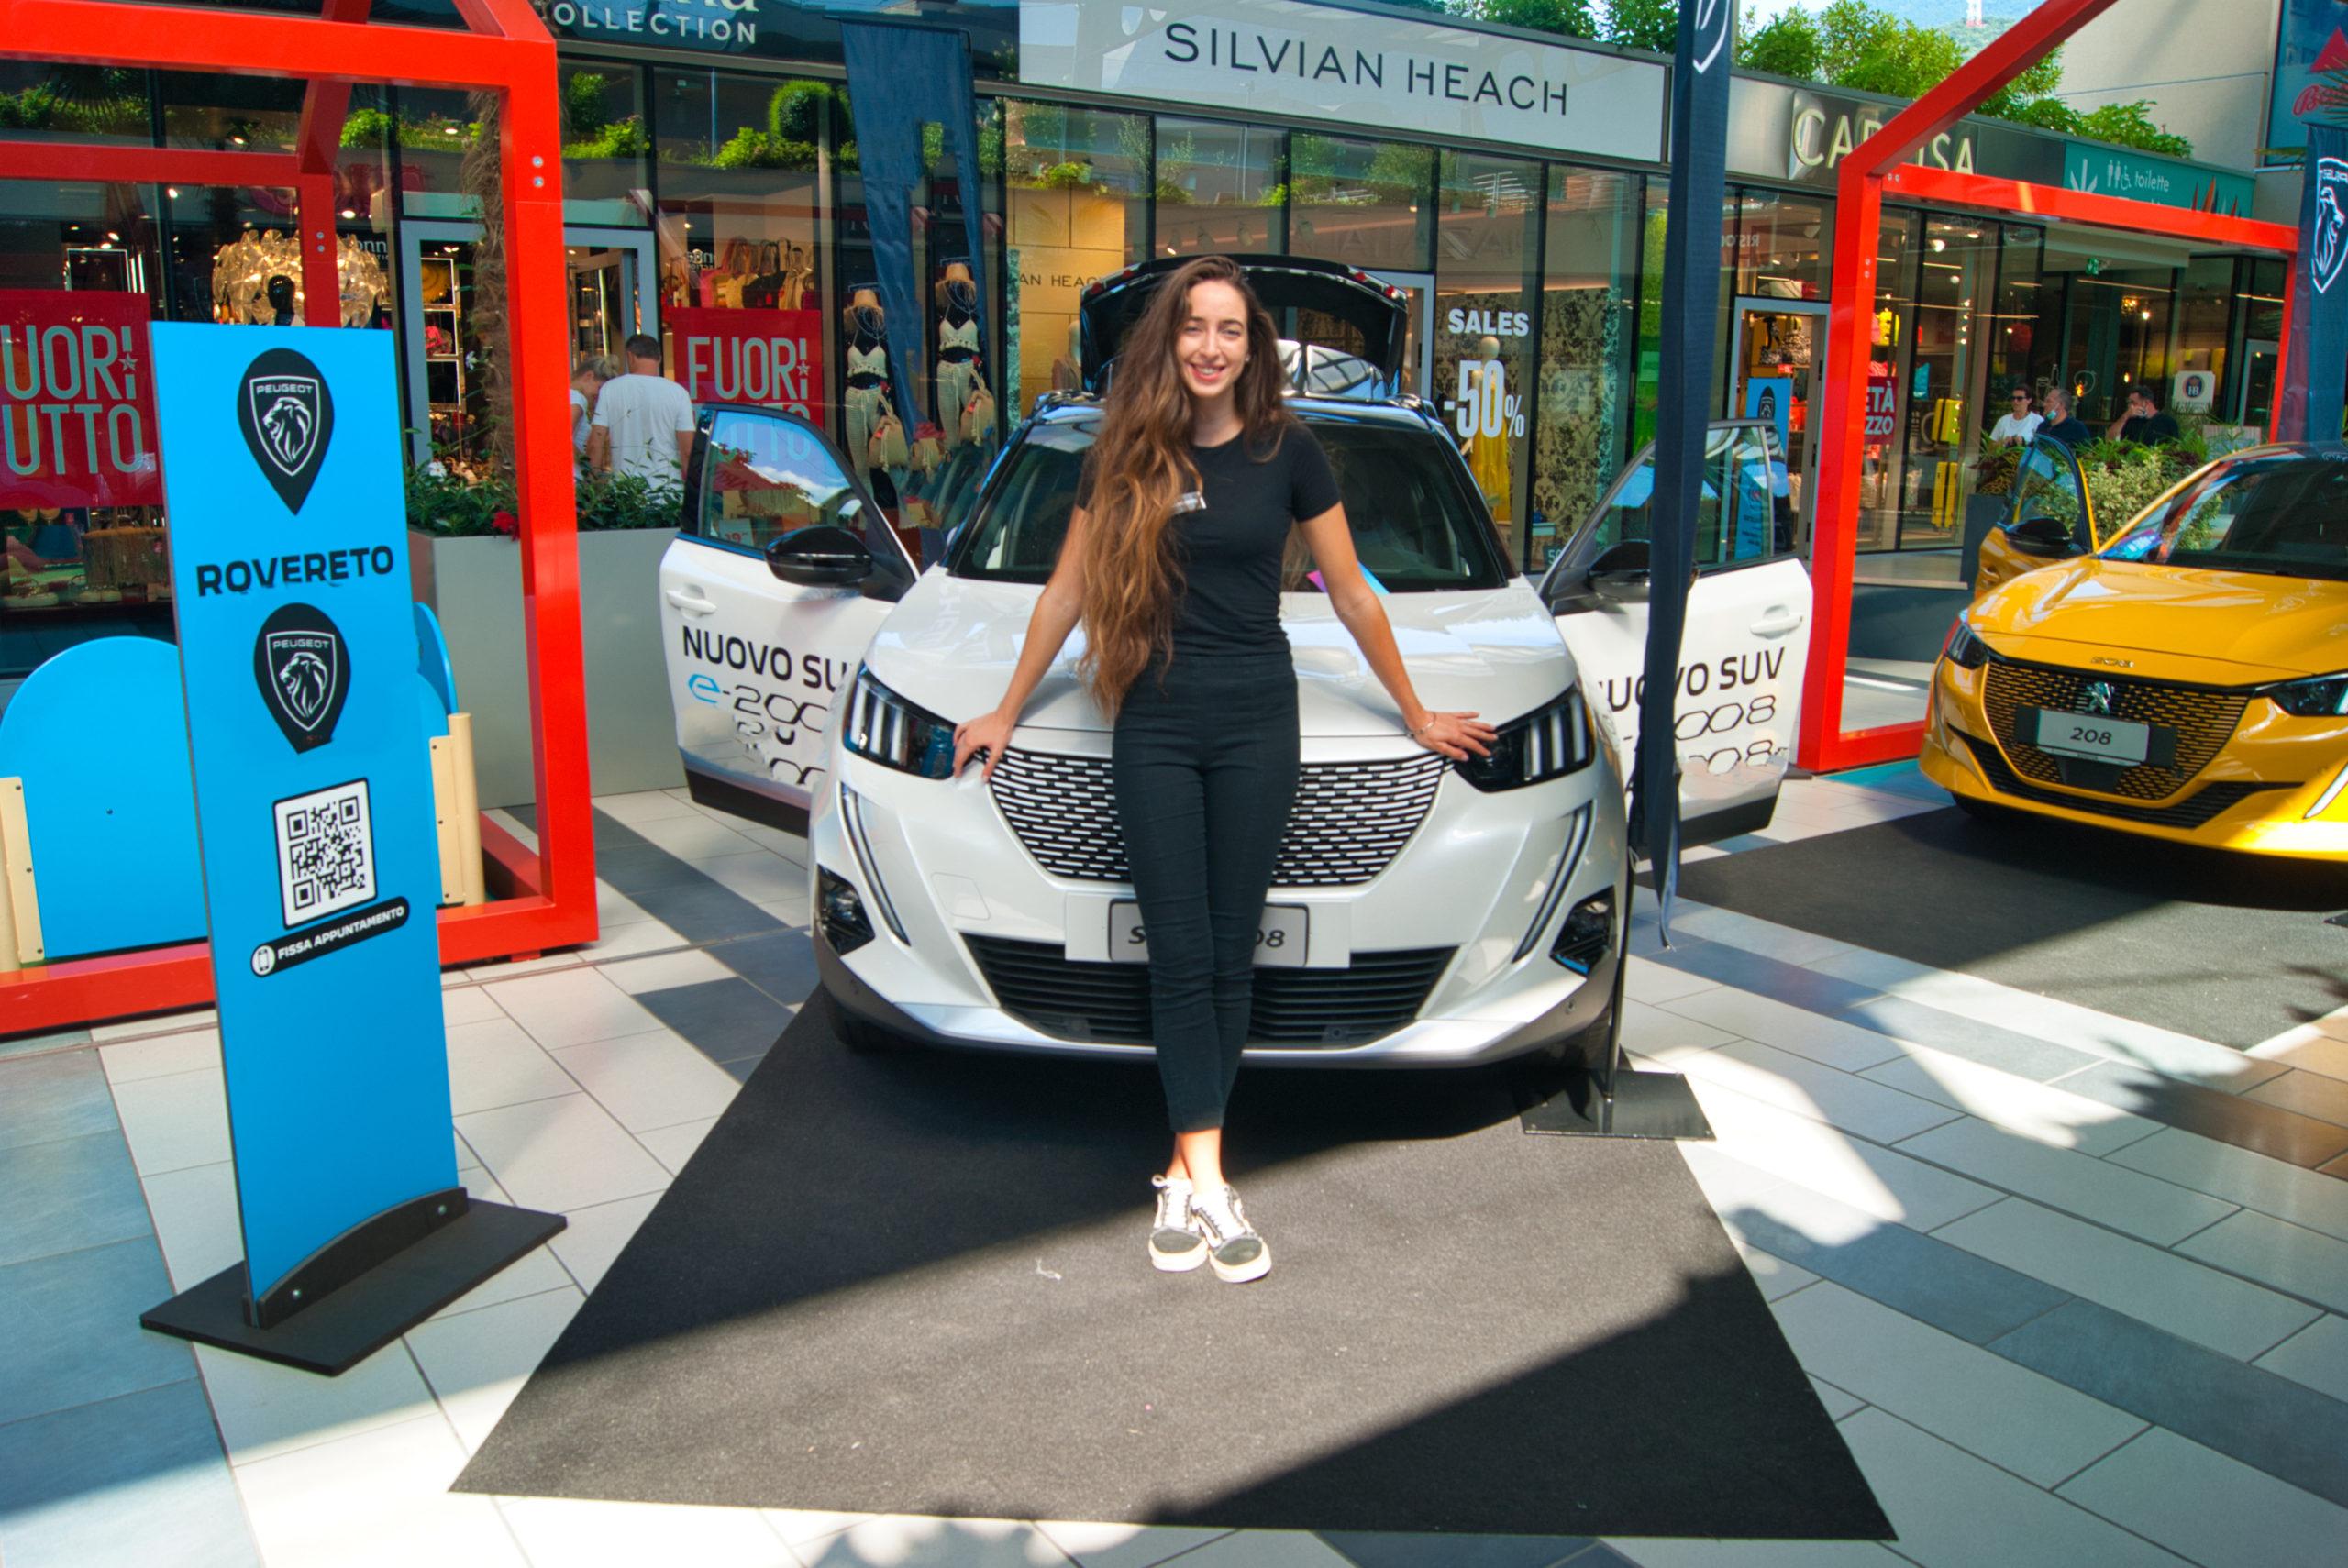 Centro Commerciale Blue Garden Riva del Garda, Anna